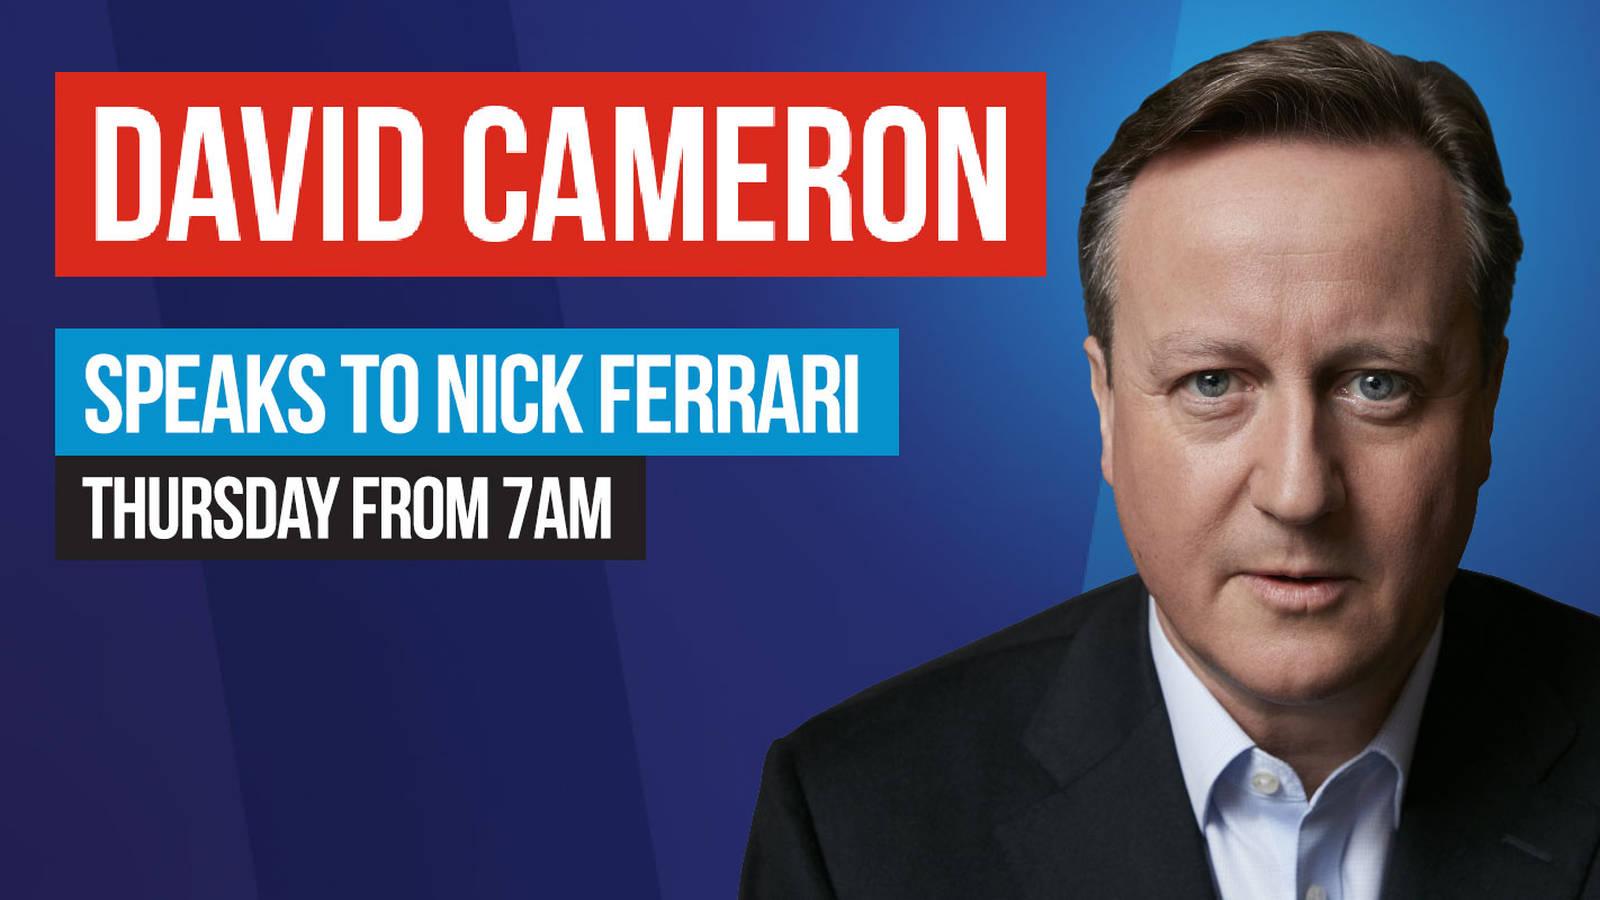 David Cameron Speaks To Nick Ferrari: Thursday From 7am